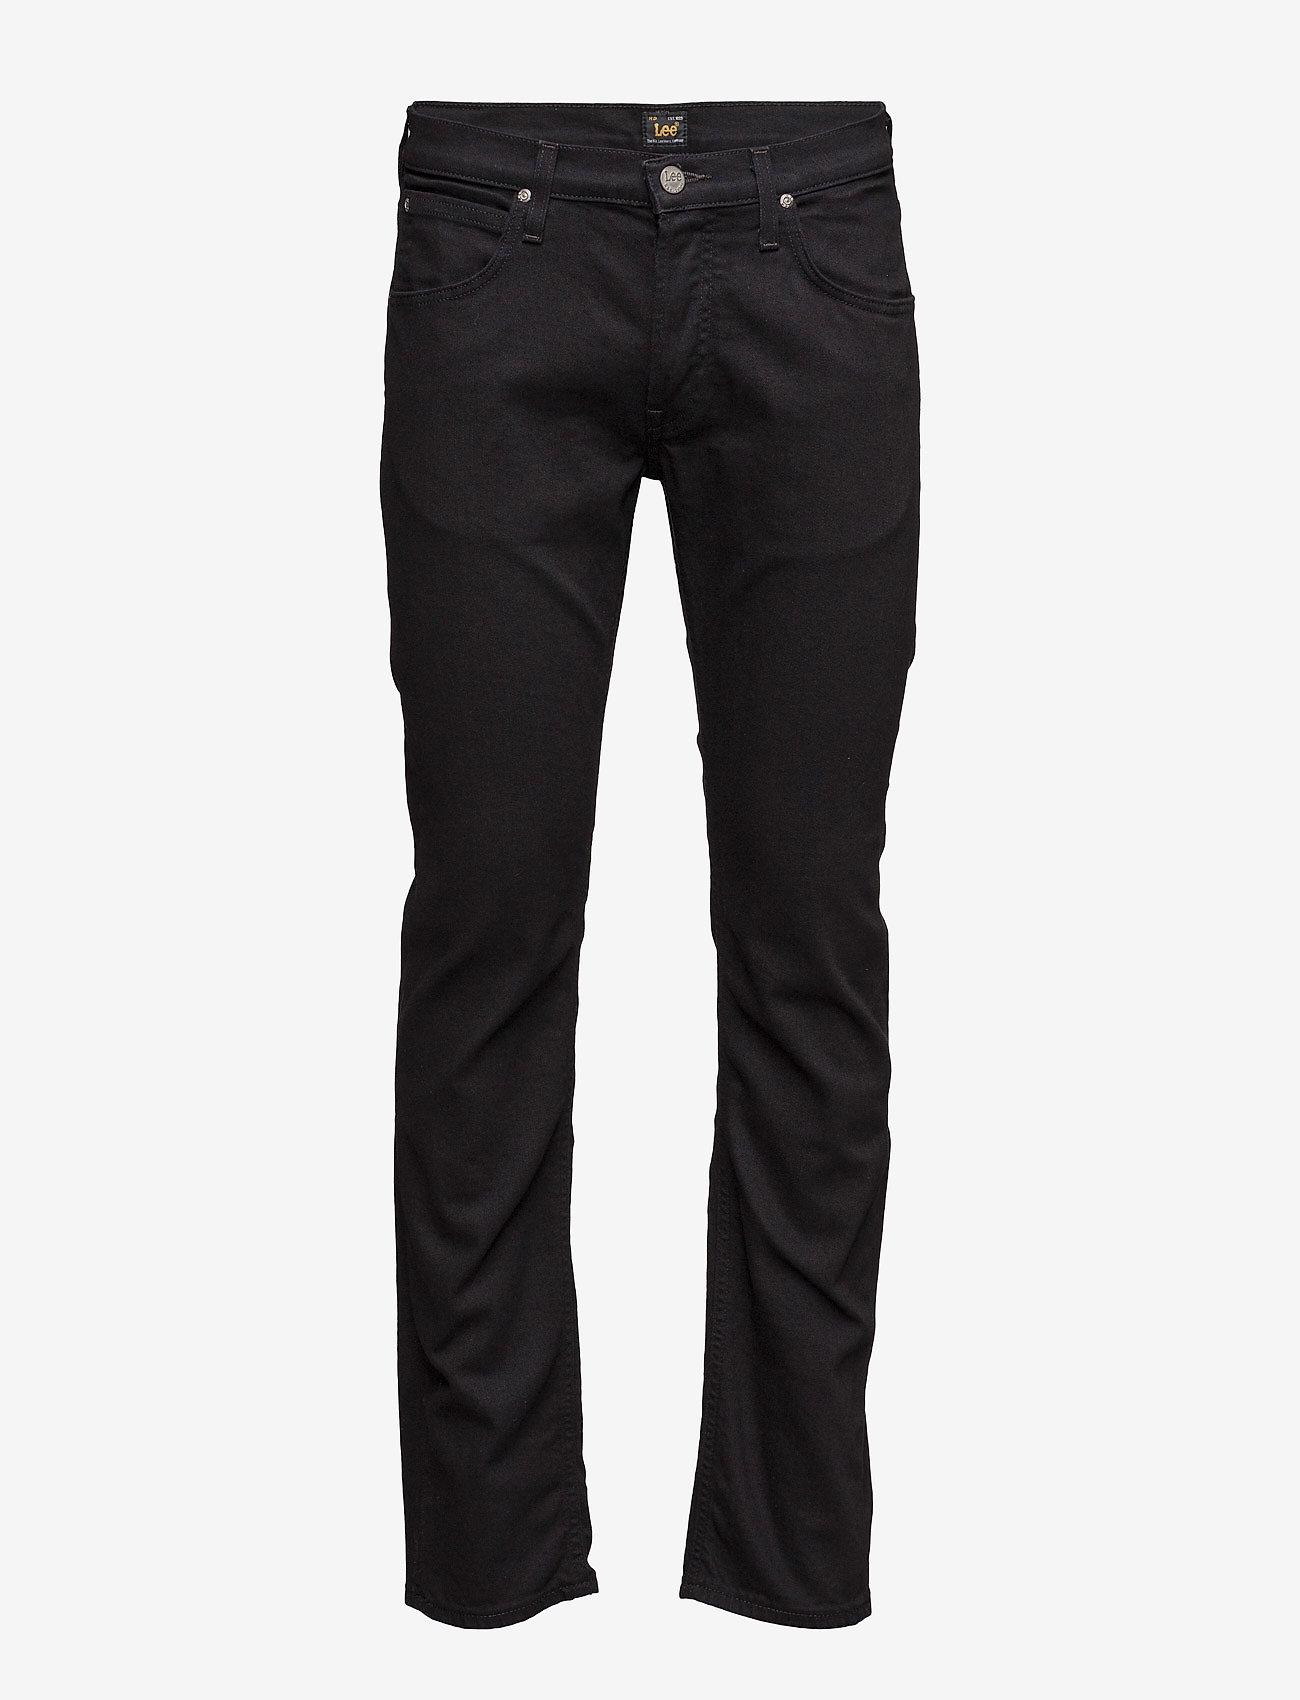 Lee Jeans - DAREN CLEAN BLACK - regular jeans - clean black - 1